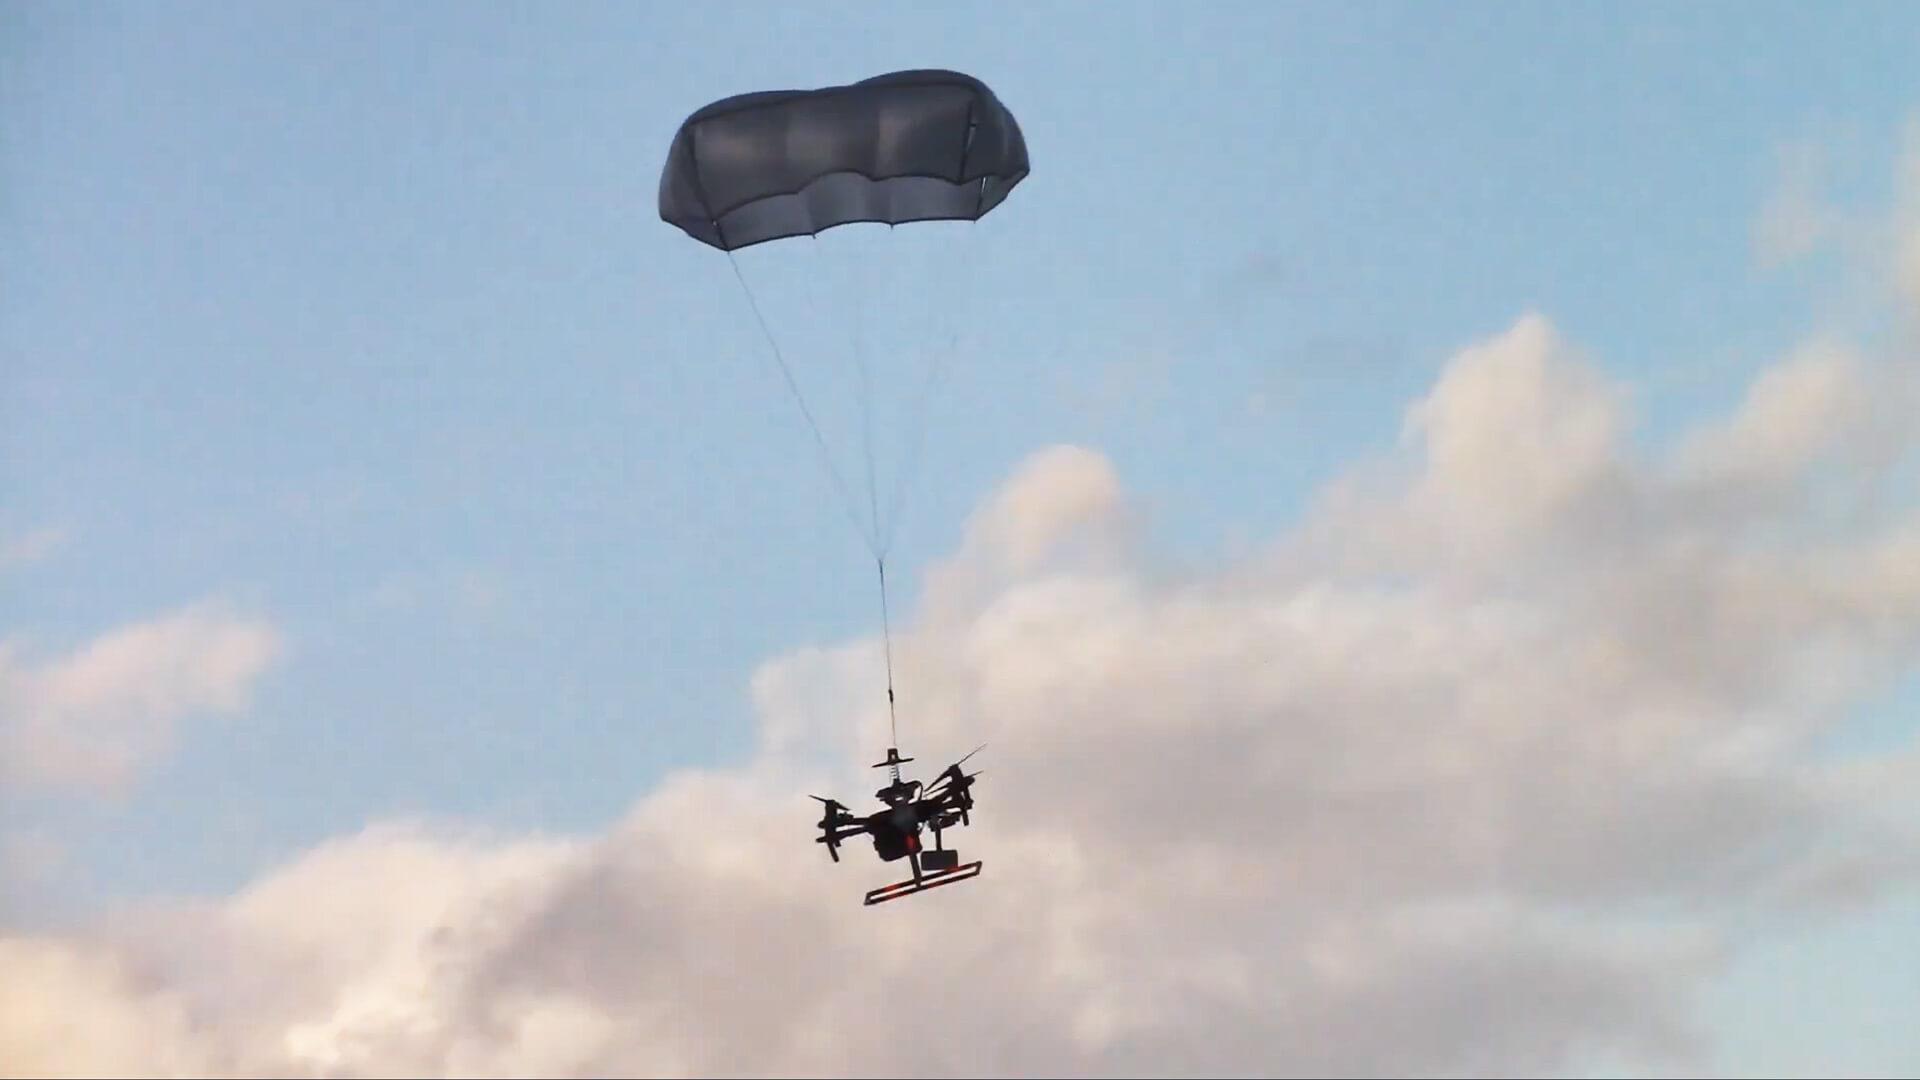 AVSS Parachute Test